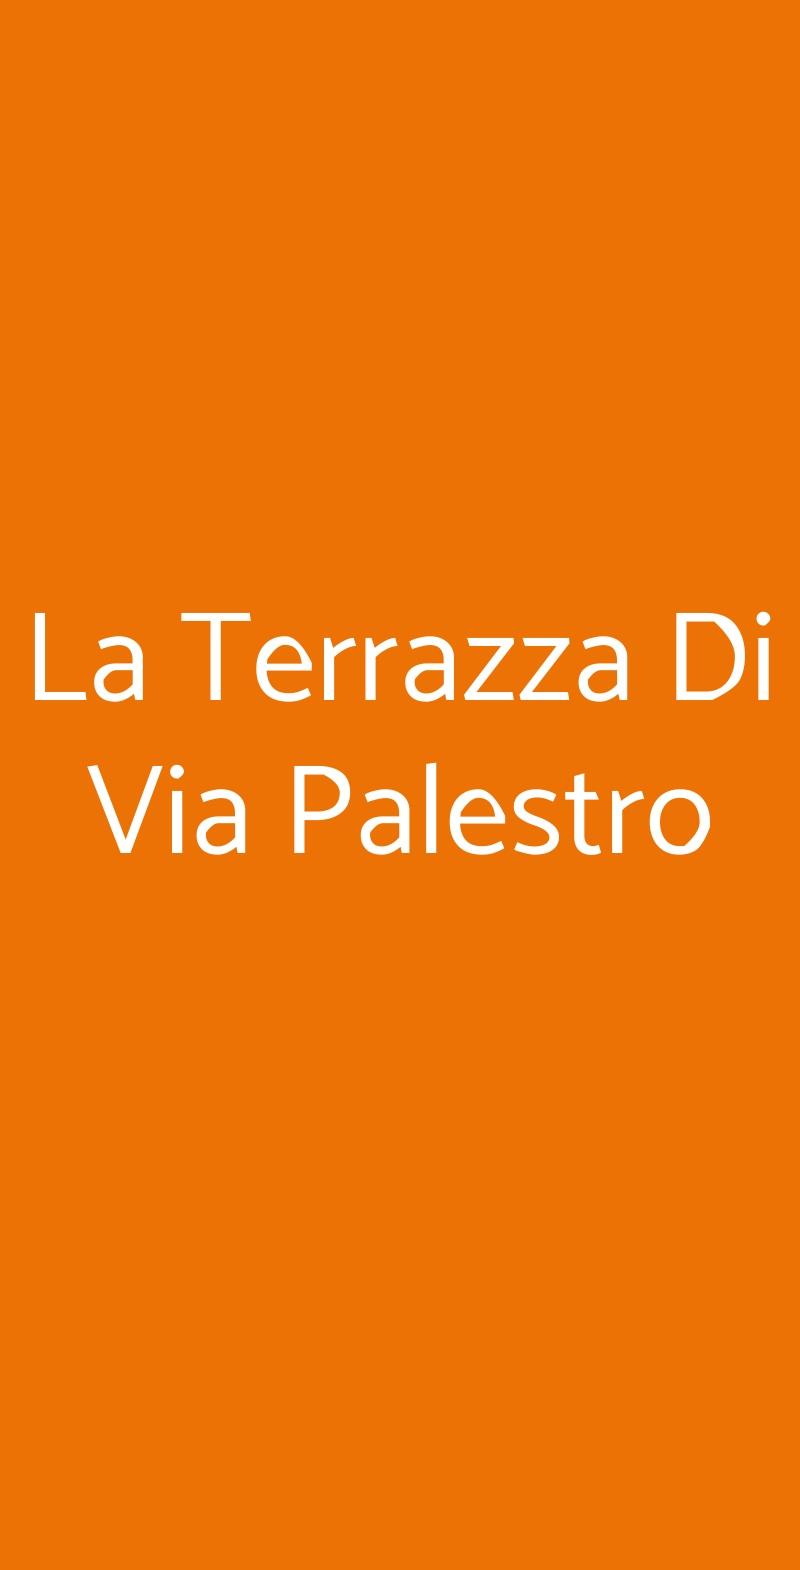 La Terrazza Di Via Palestro Deliveroo Sluurpy It